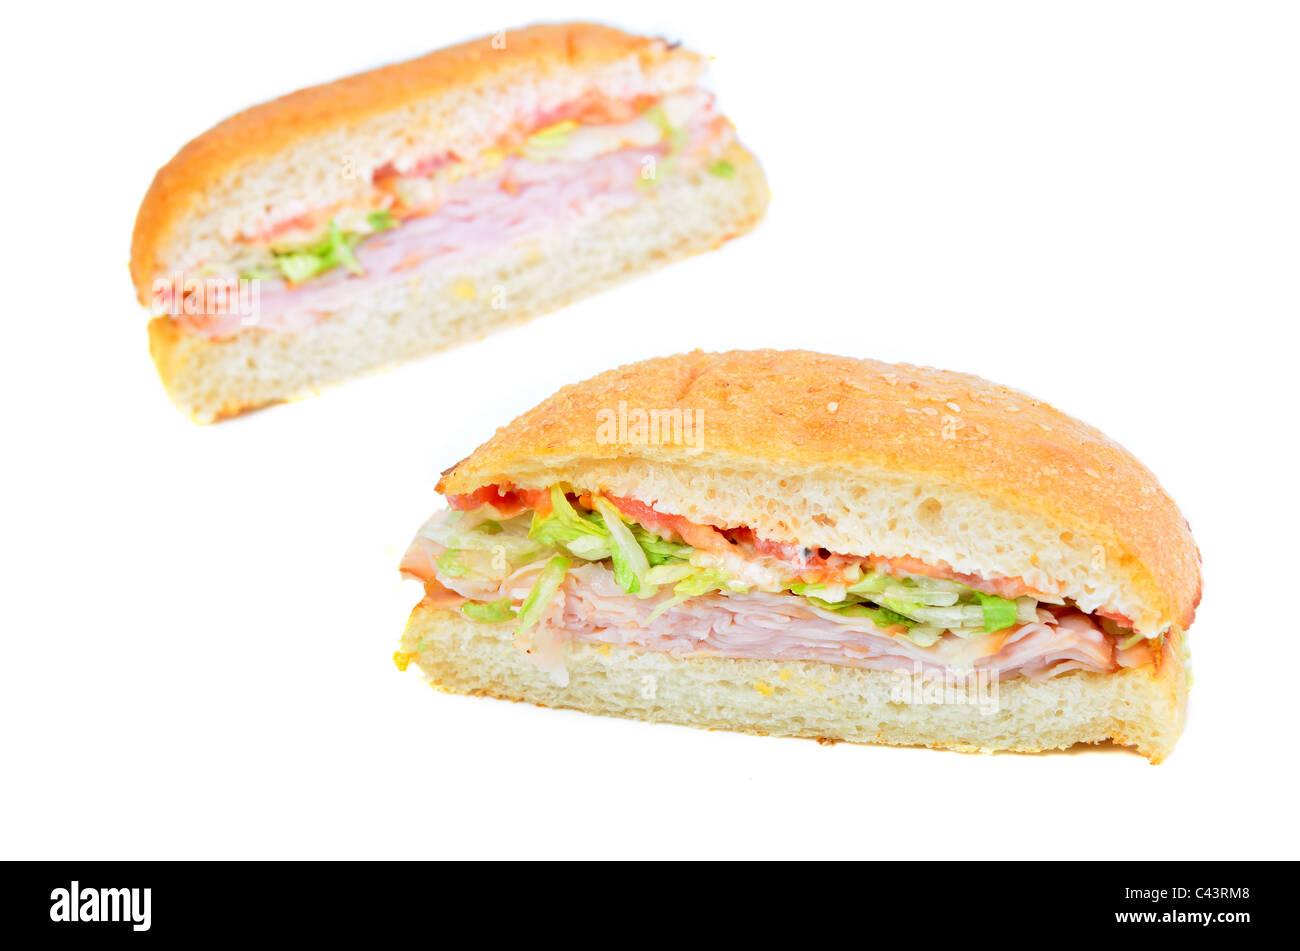 Deli Turkey Sandwich isolated on white - Stock Image